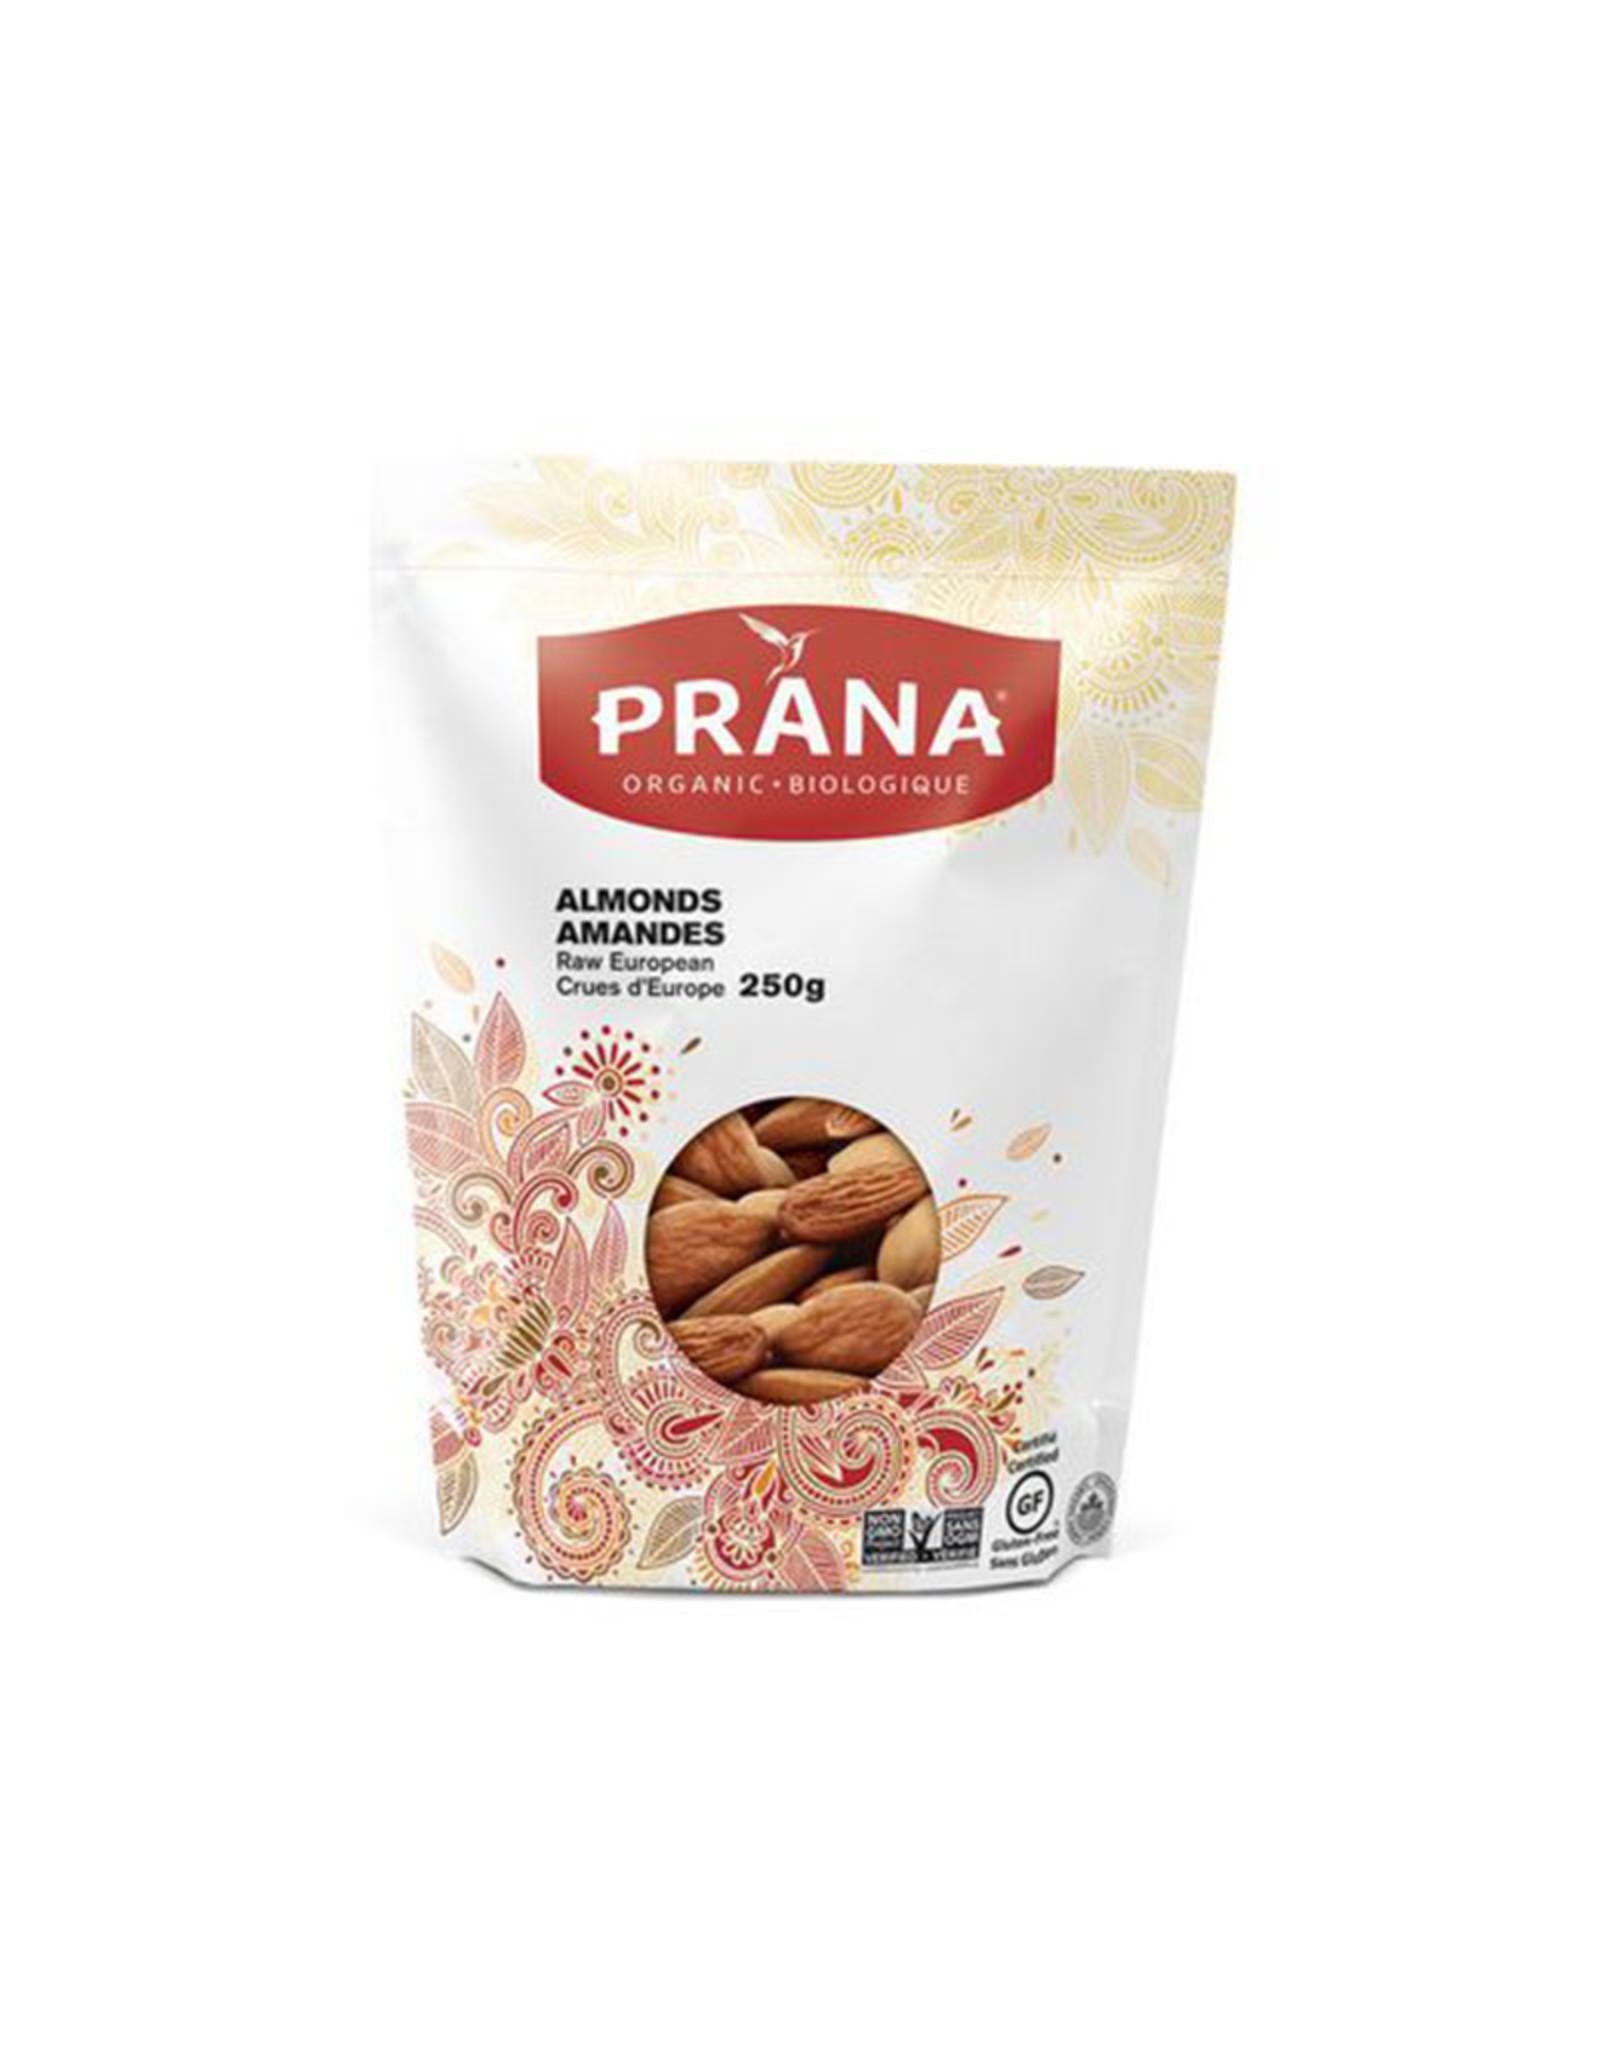 Prana Prana - Noix Séchées, Amandes Crues d'Europe Bio (250g)